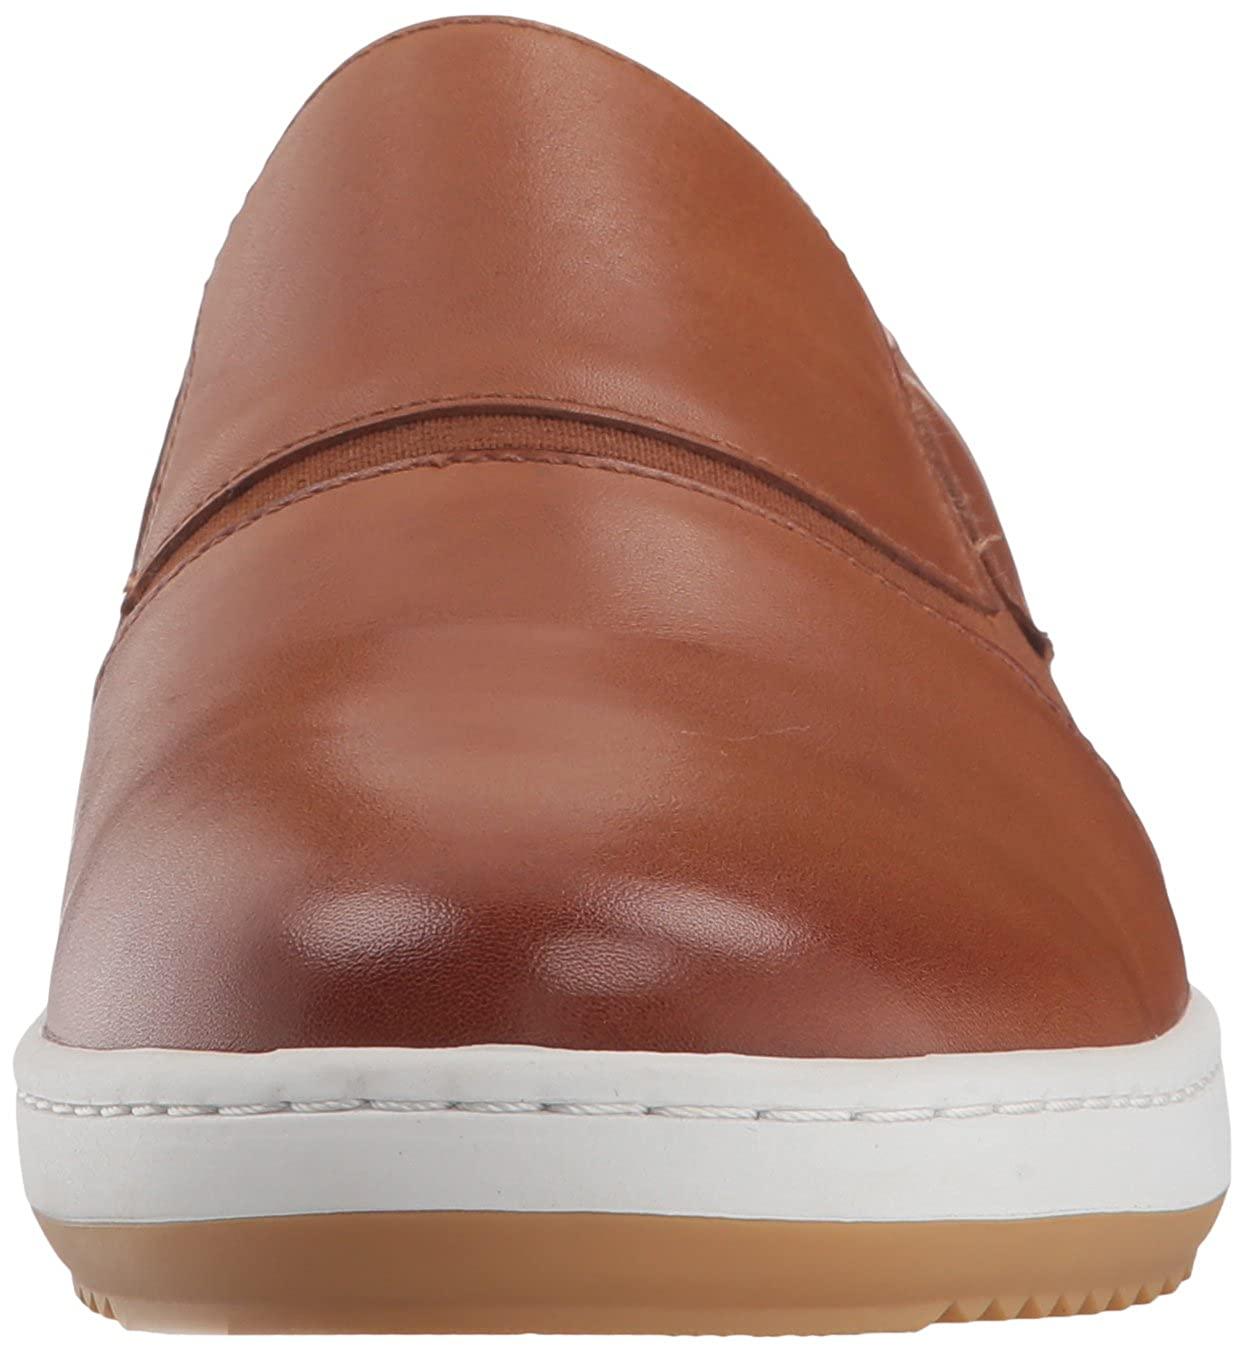 Zanzara Men's Sneakers Studio Sneaker B075XZ43Z7 Fashion Sneakers Men's 003ec6